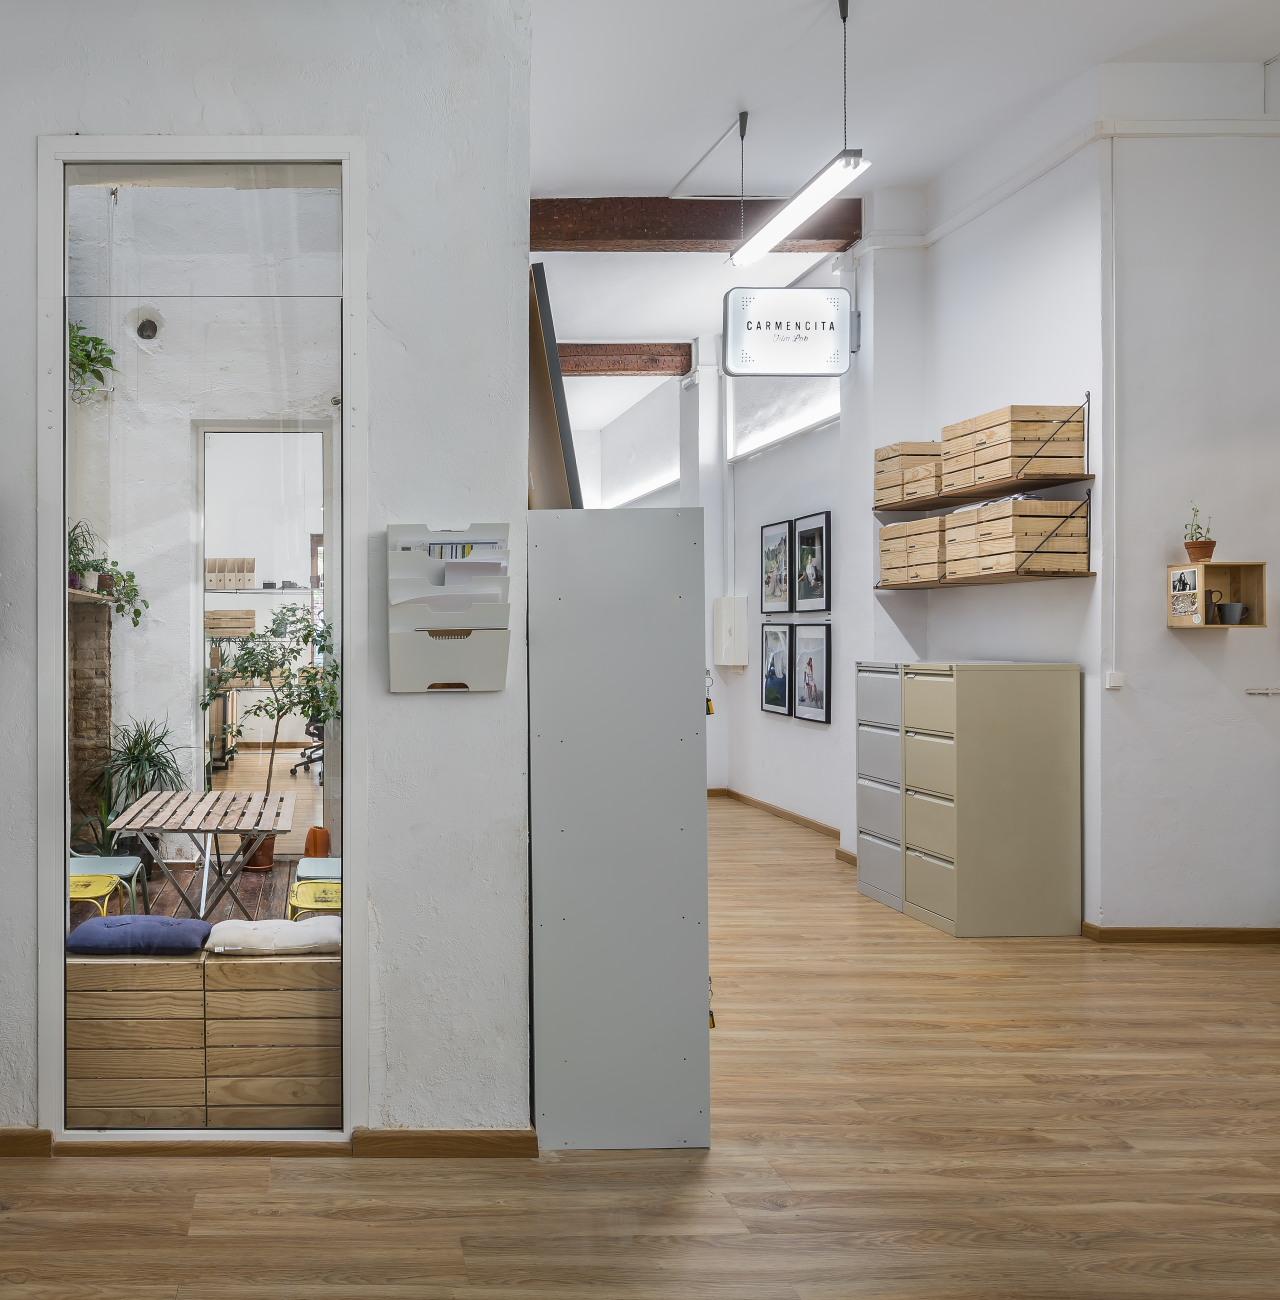 fotografia-arquitectura-interiorismo-valencia-german-cabo-boubau-carmencita-carmencitafilmlab (16)